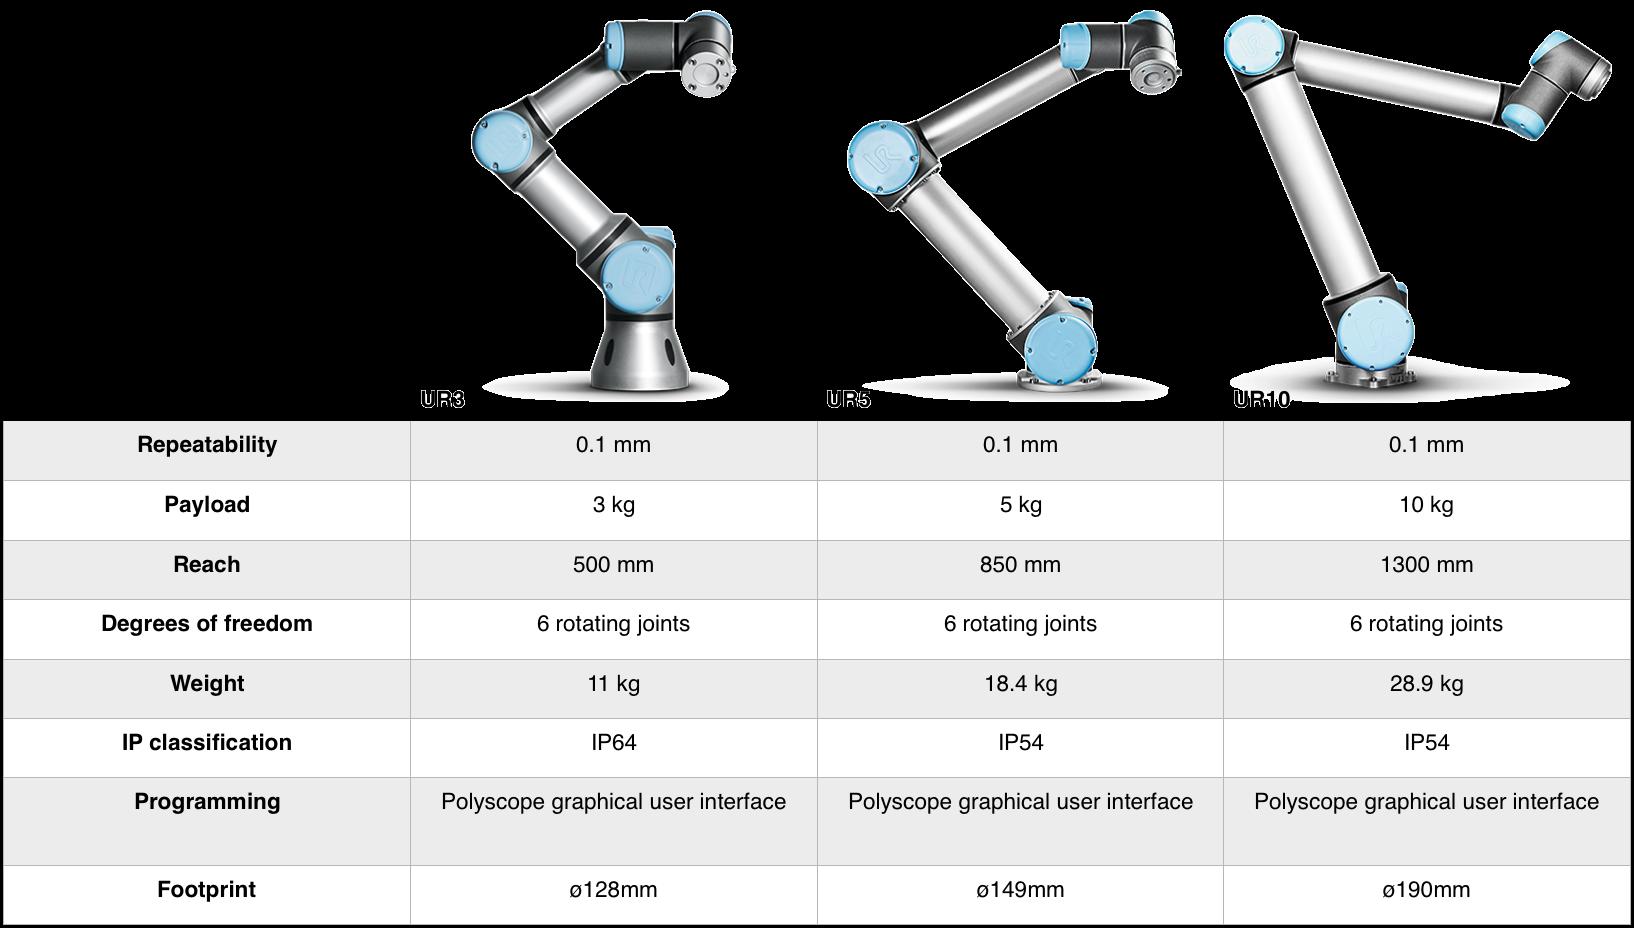 Universal Robots Table